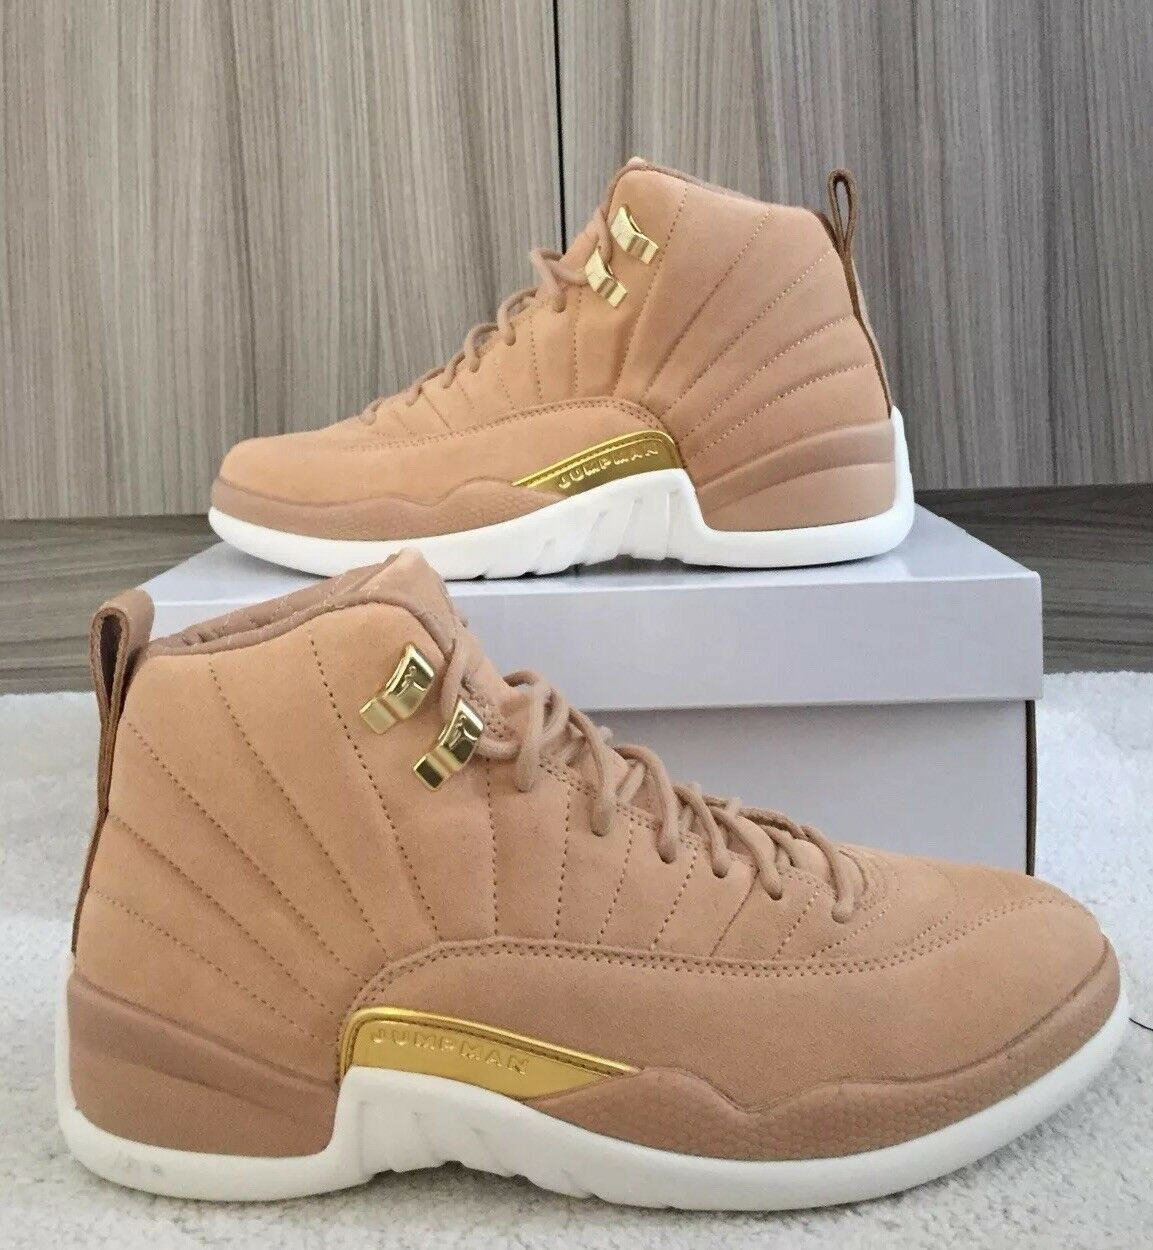 Jordan 12 Vachetta Tan   Size 6